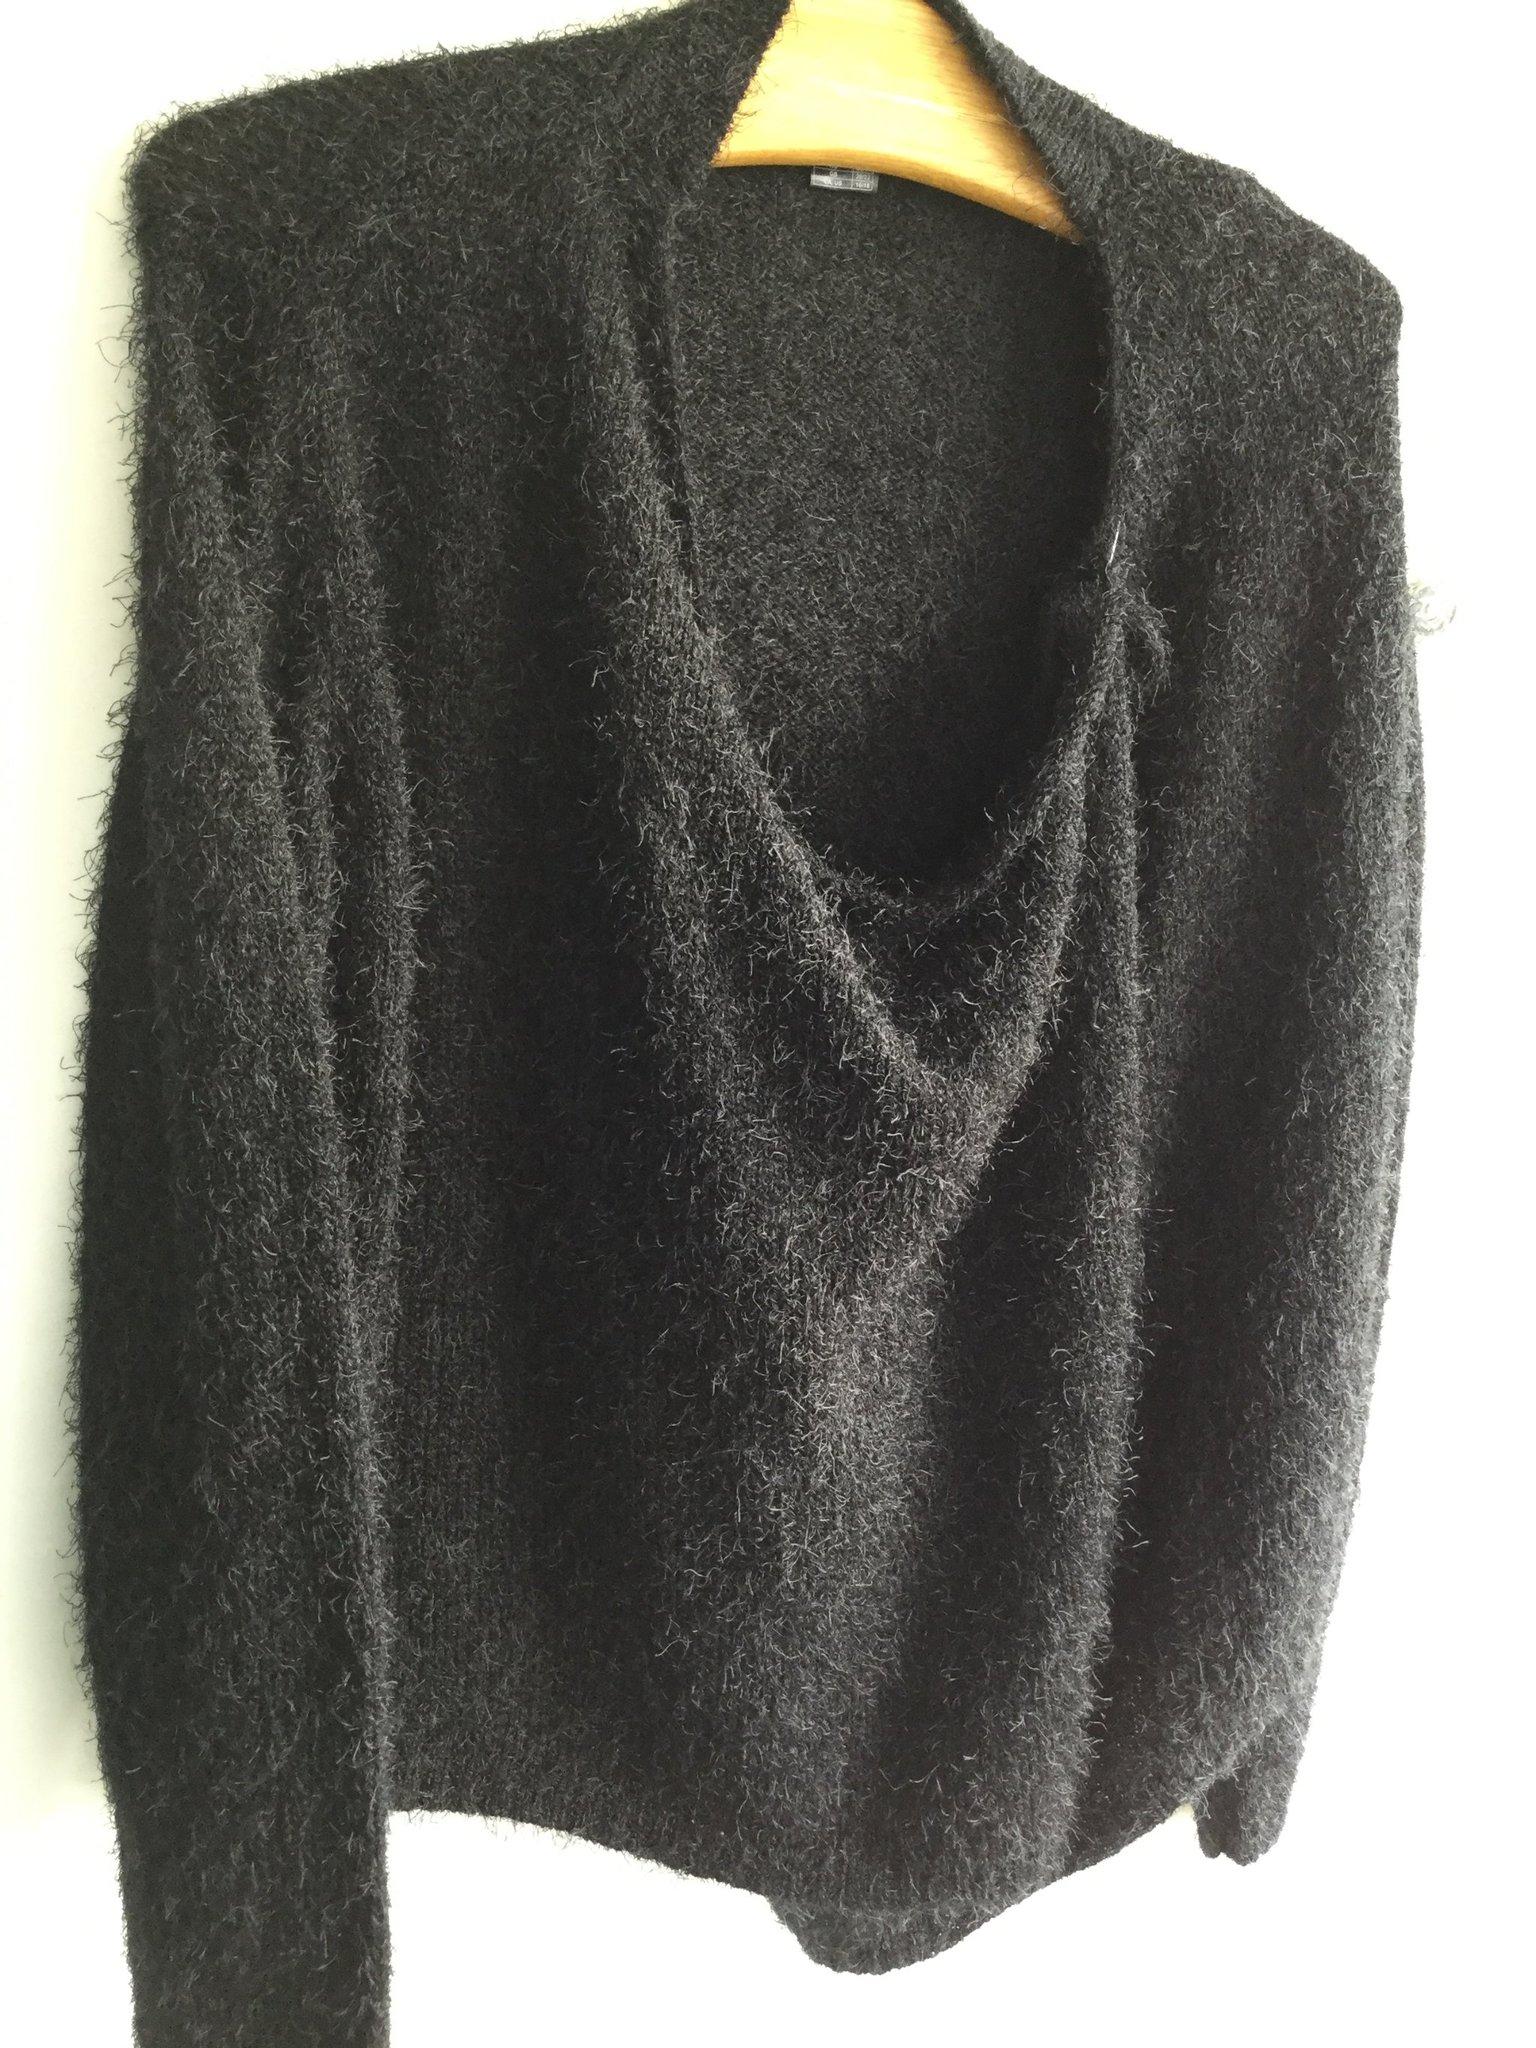 långa svarta koftor